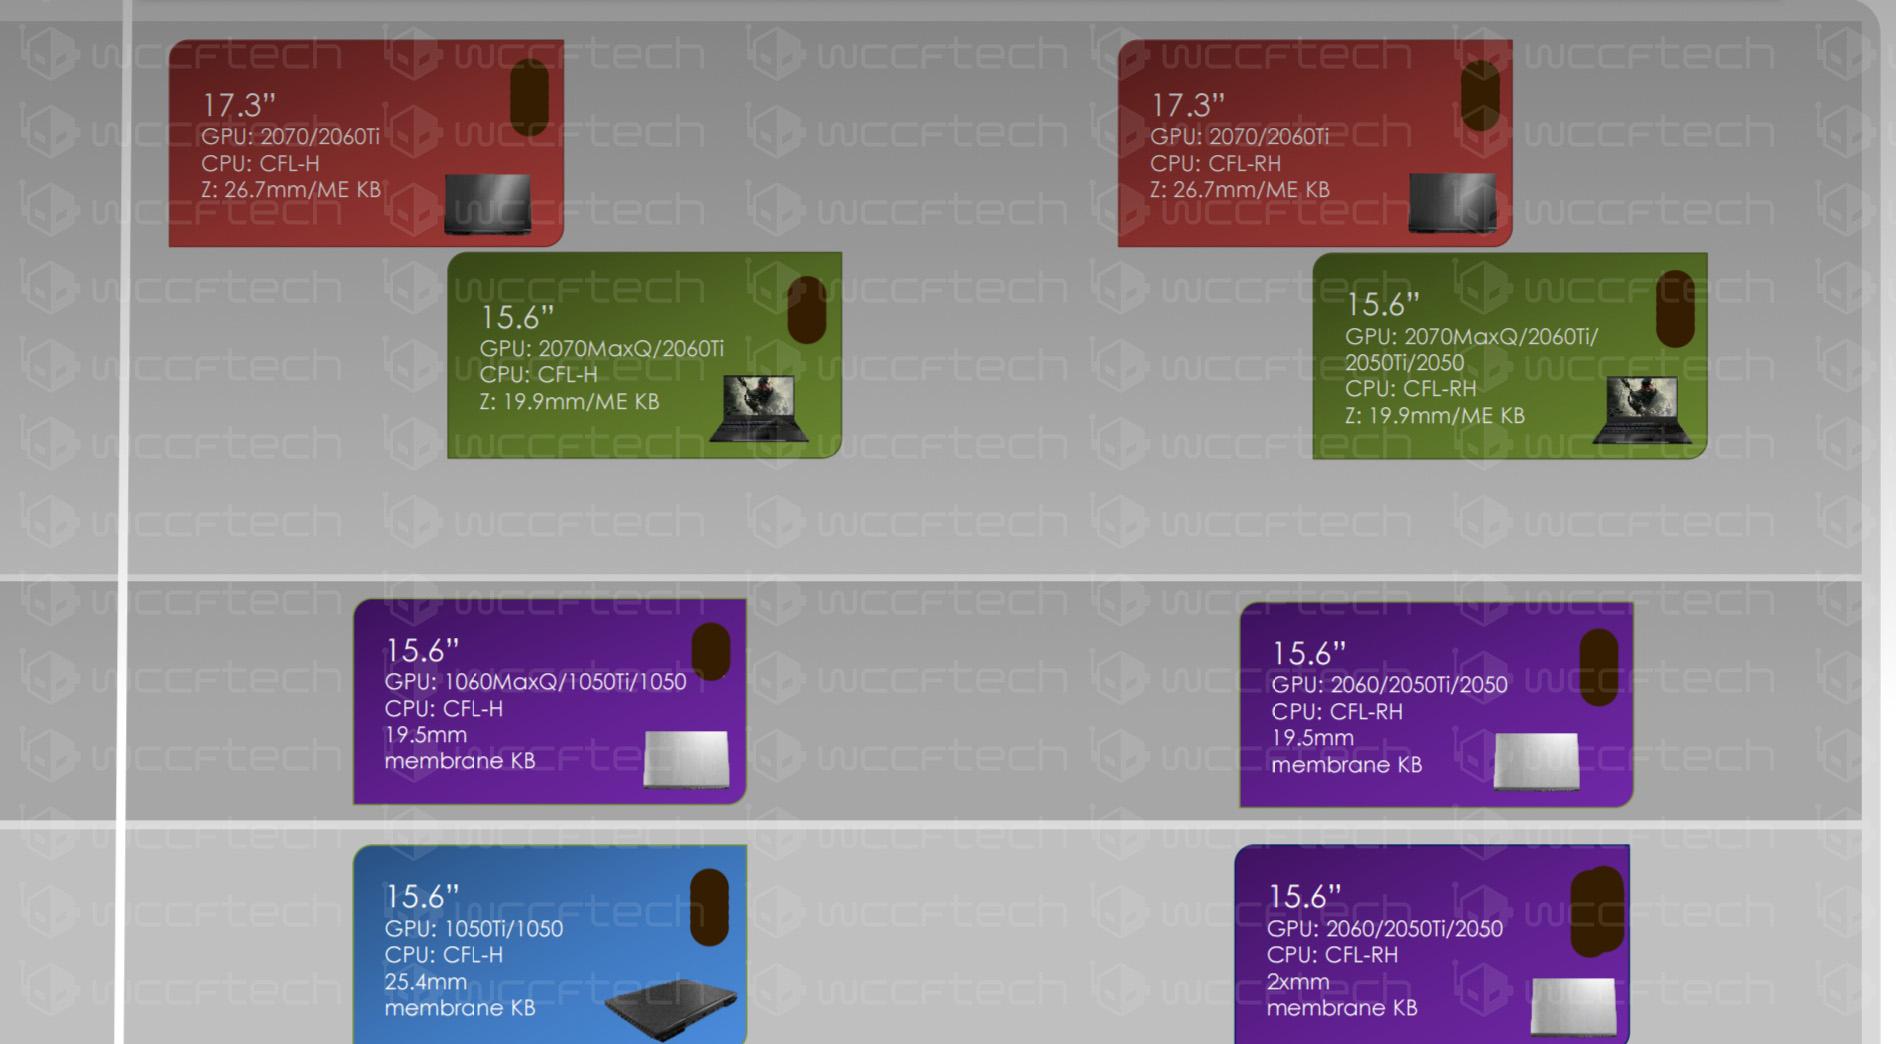 NVIDIA-RTX-Mobility-Series-2070-Max-Q-2070-2060-Ti-2060-2050-Ti-2050